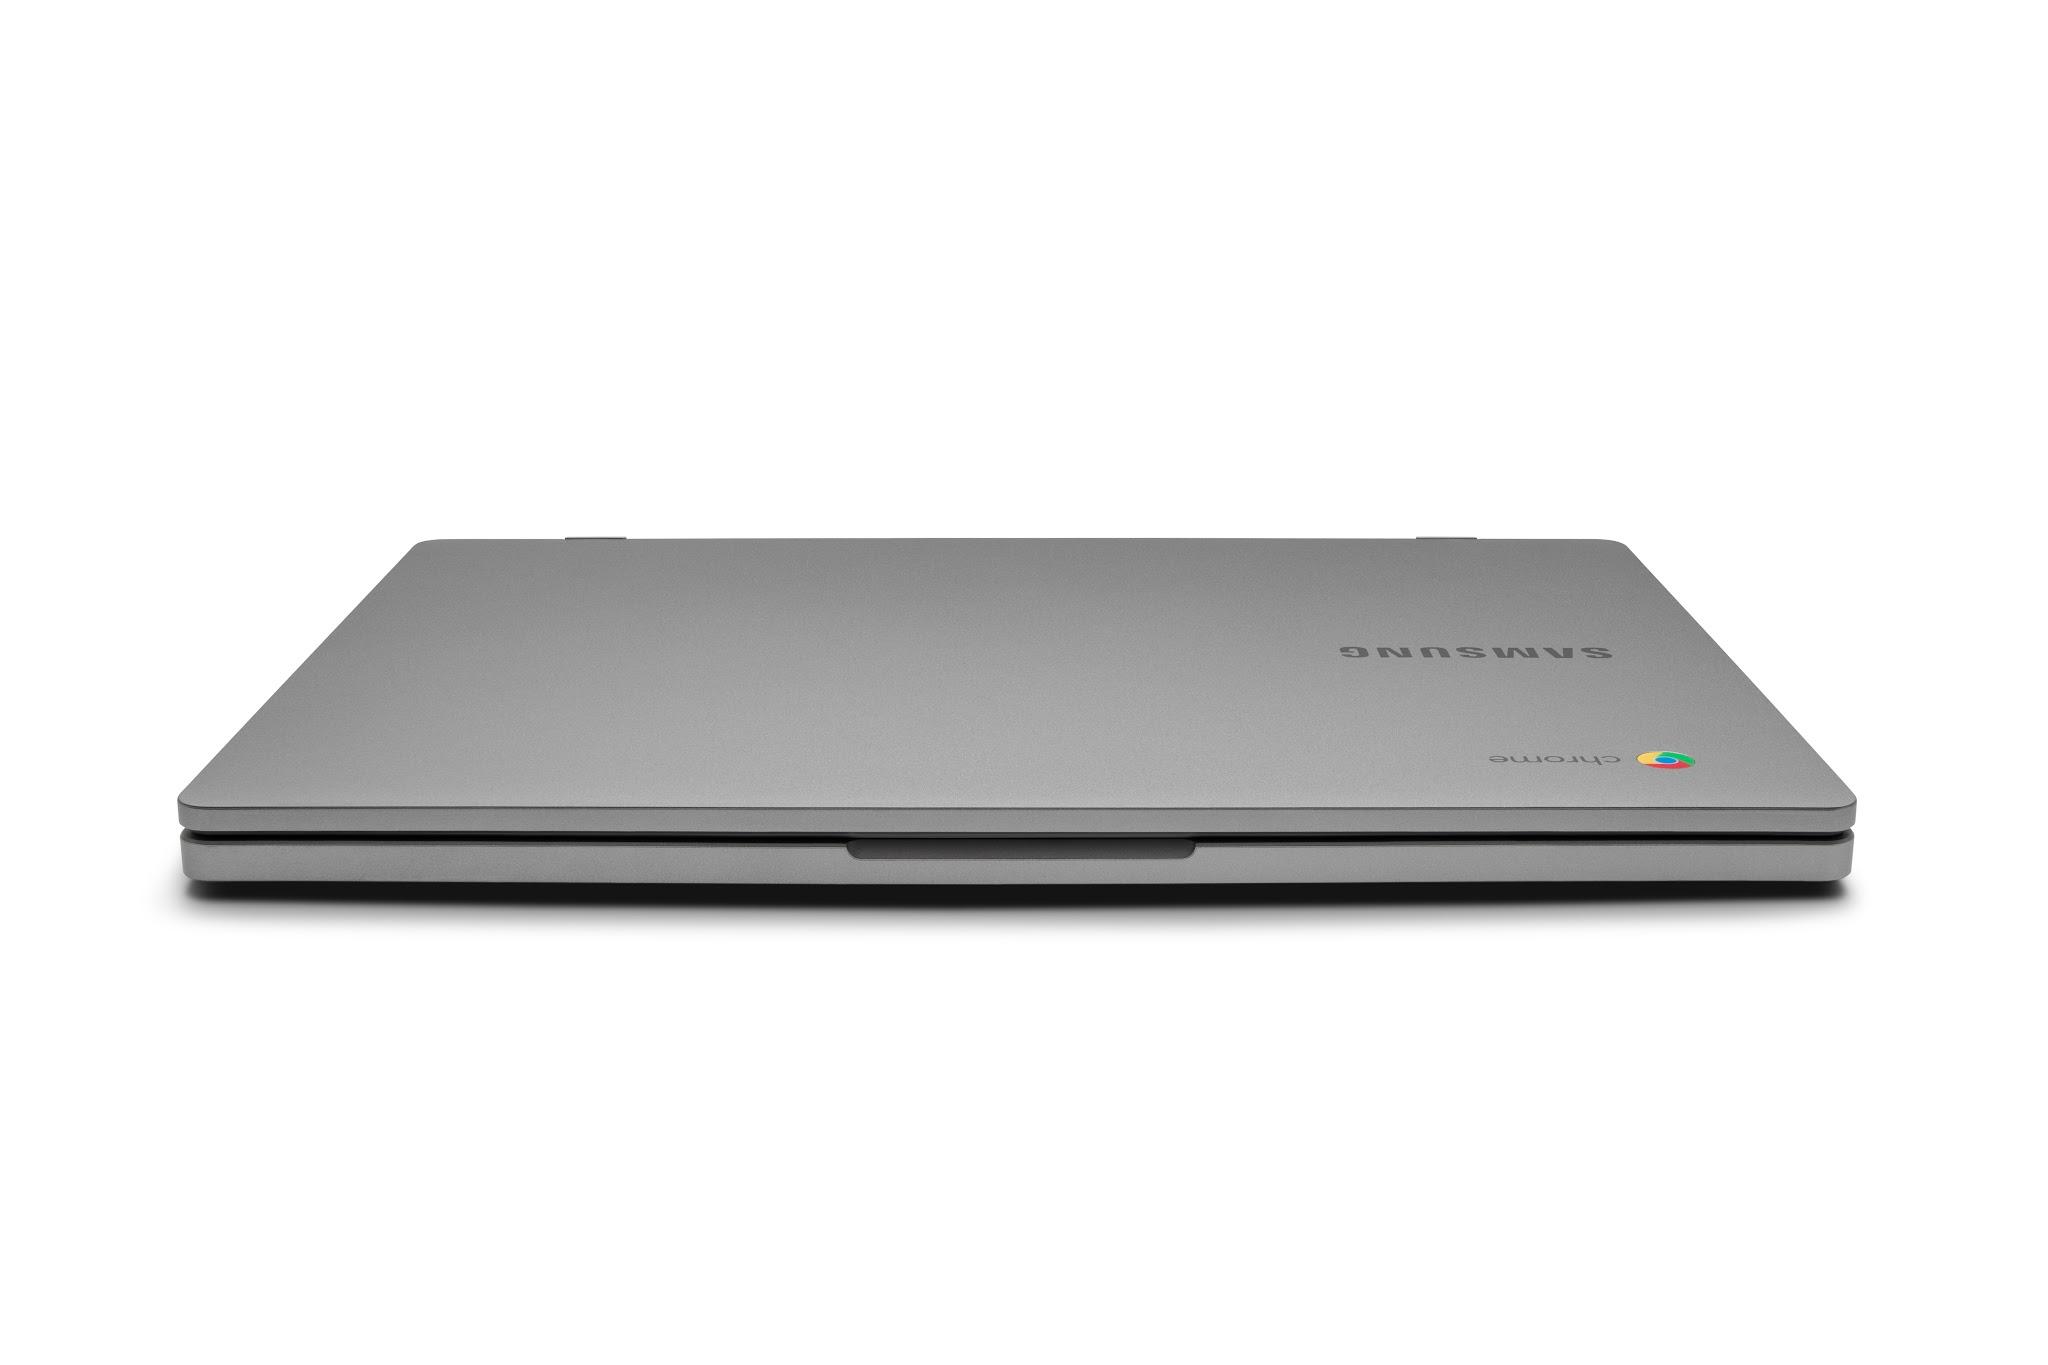 Samsung Chromebook 4 - photo 11